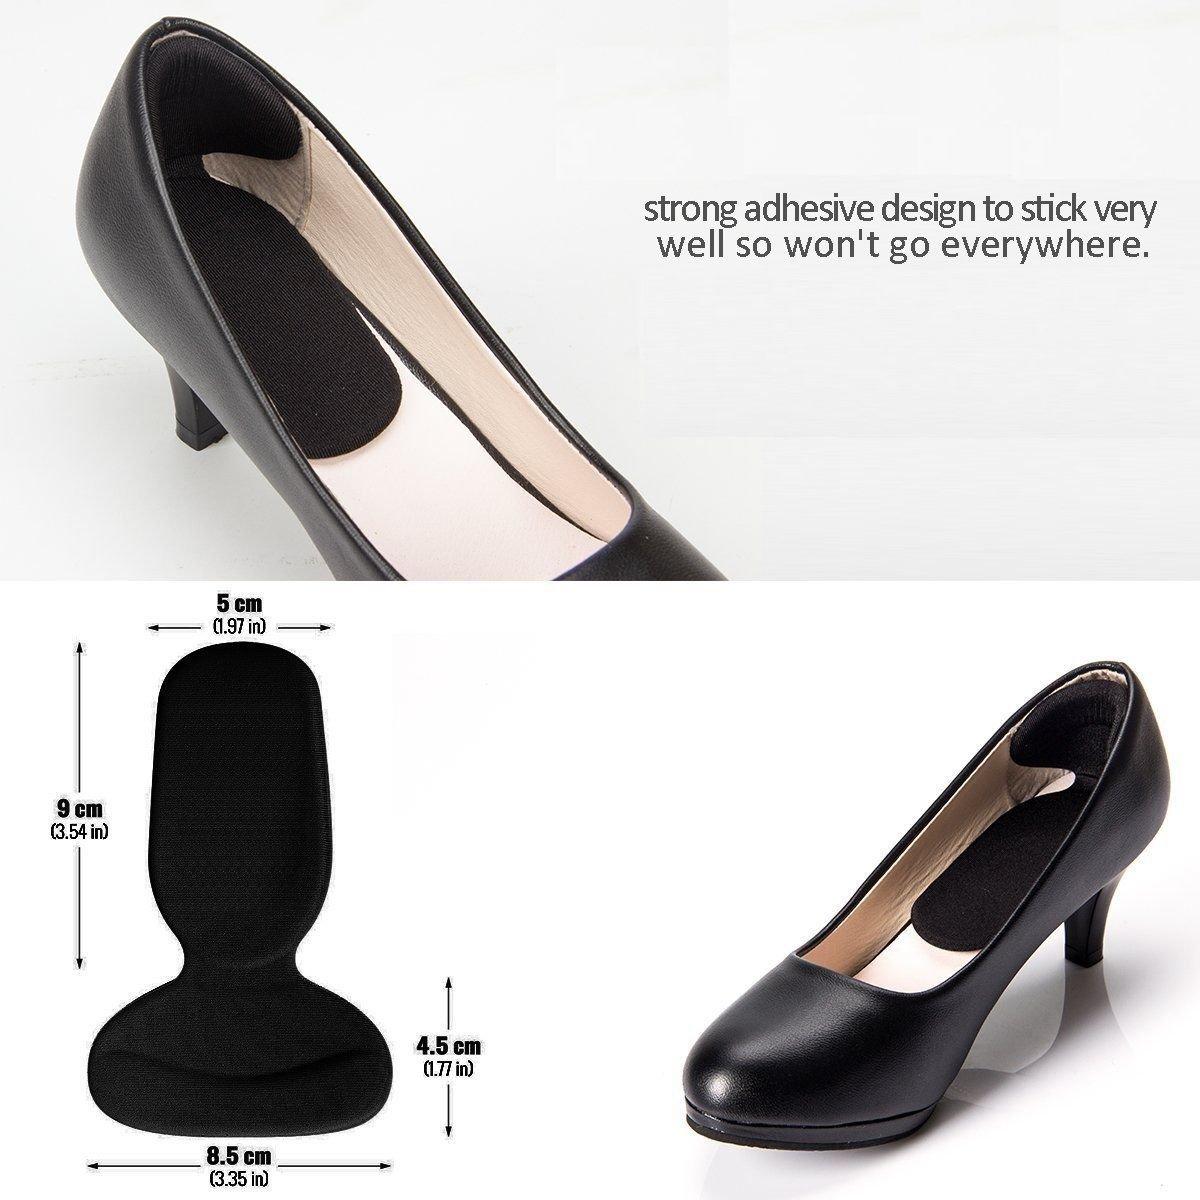 High Heel Pads (8 pcs) - High Heel Inserts, Heel Grips, Anti Slip Shoe Cushion, Ball of Foot Insoles, High Heel Liner, Heel Snugs for Women - Blister Prevention & Improve Shoes Too Big (Black)